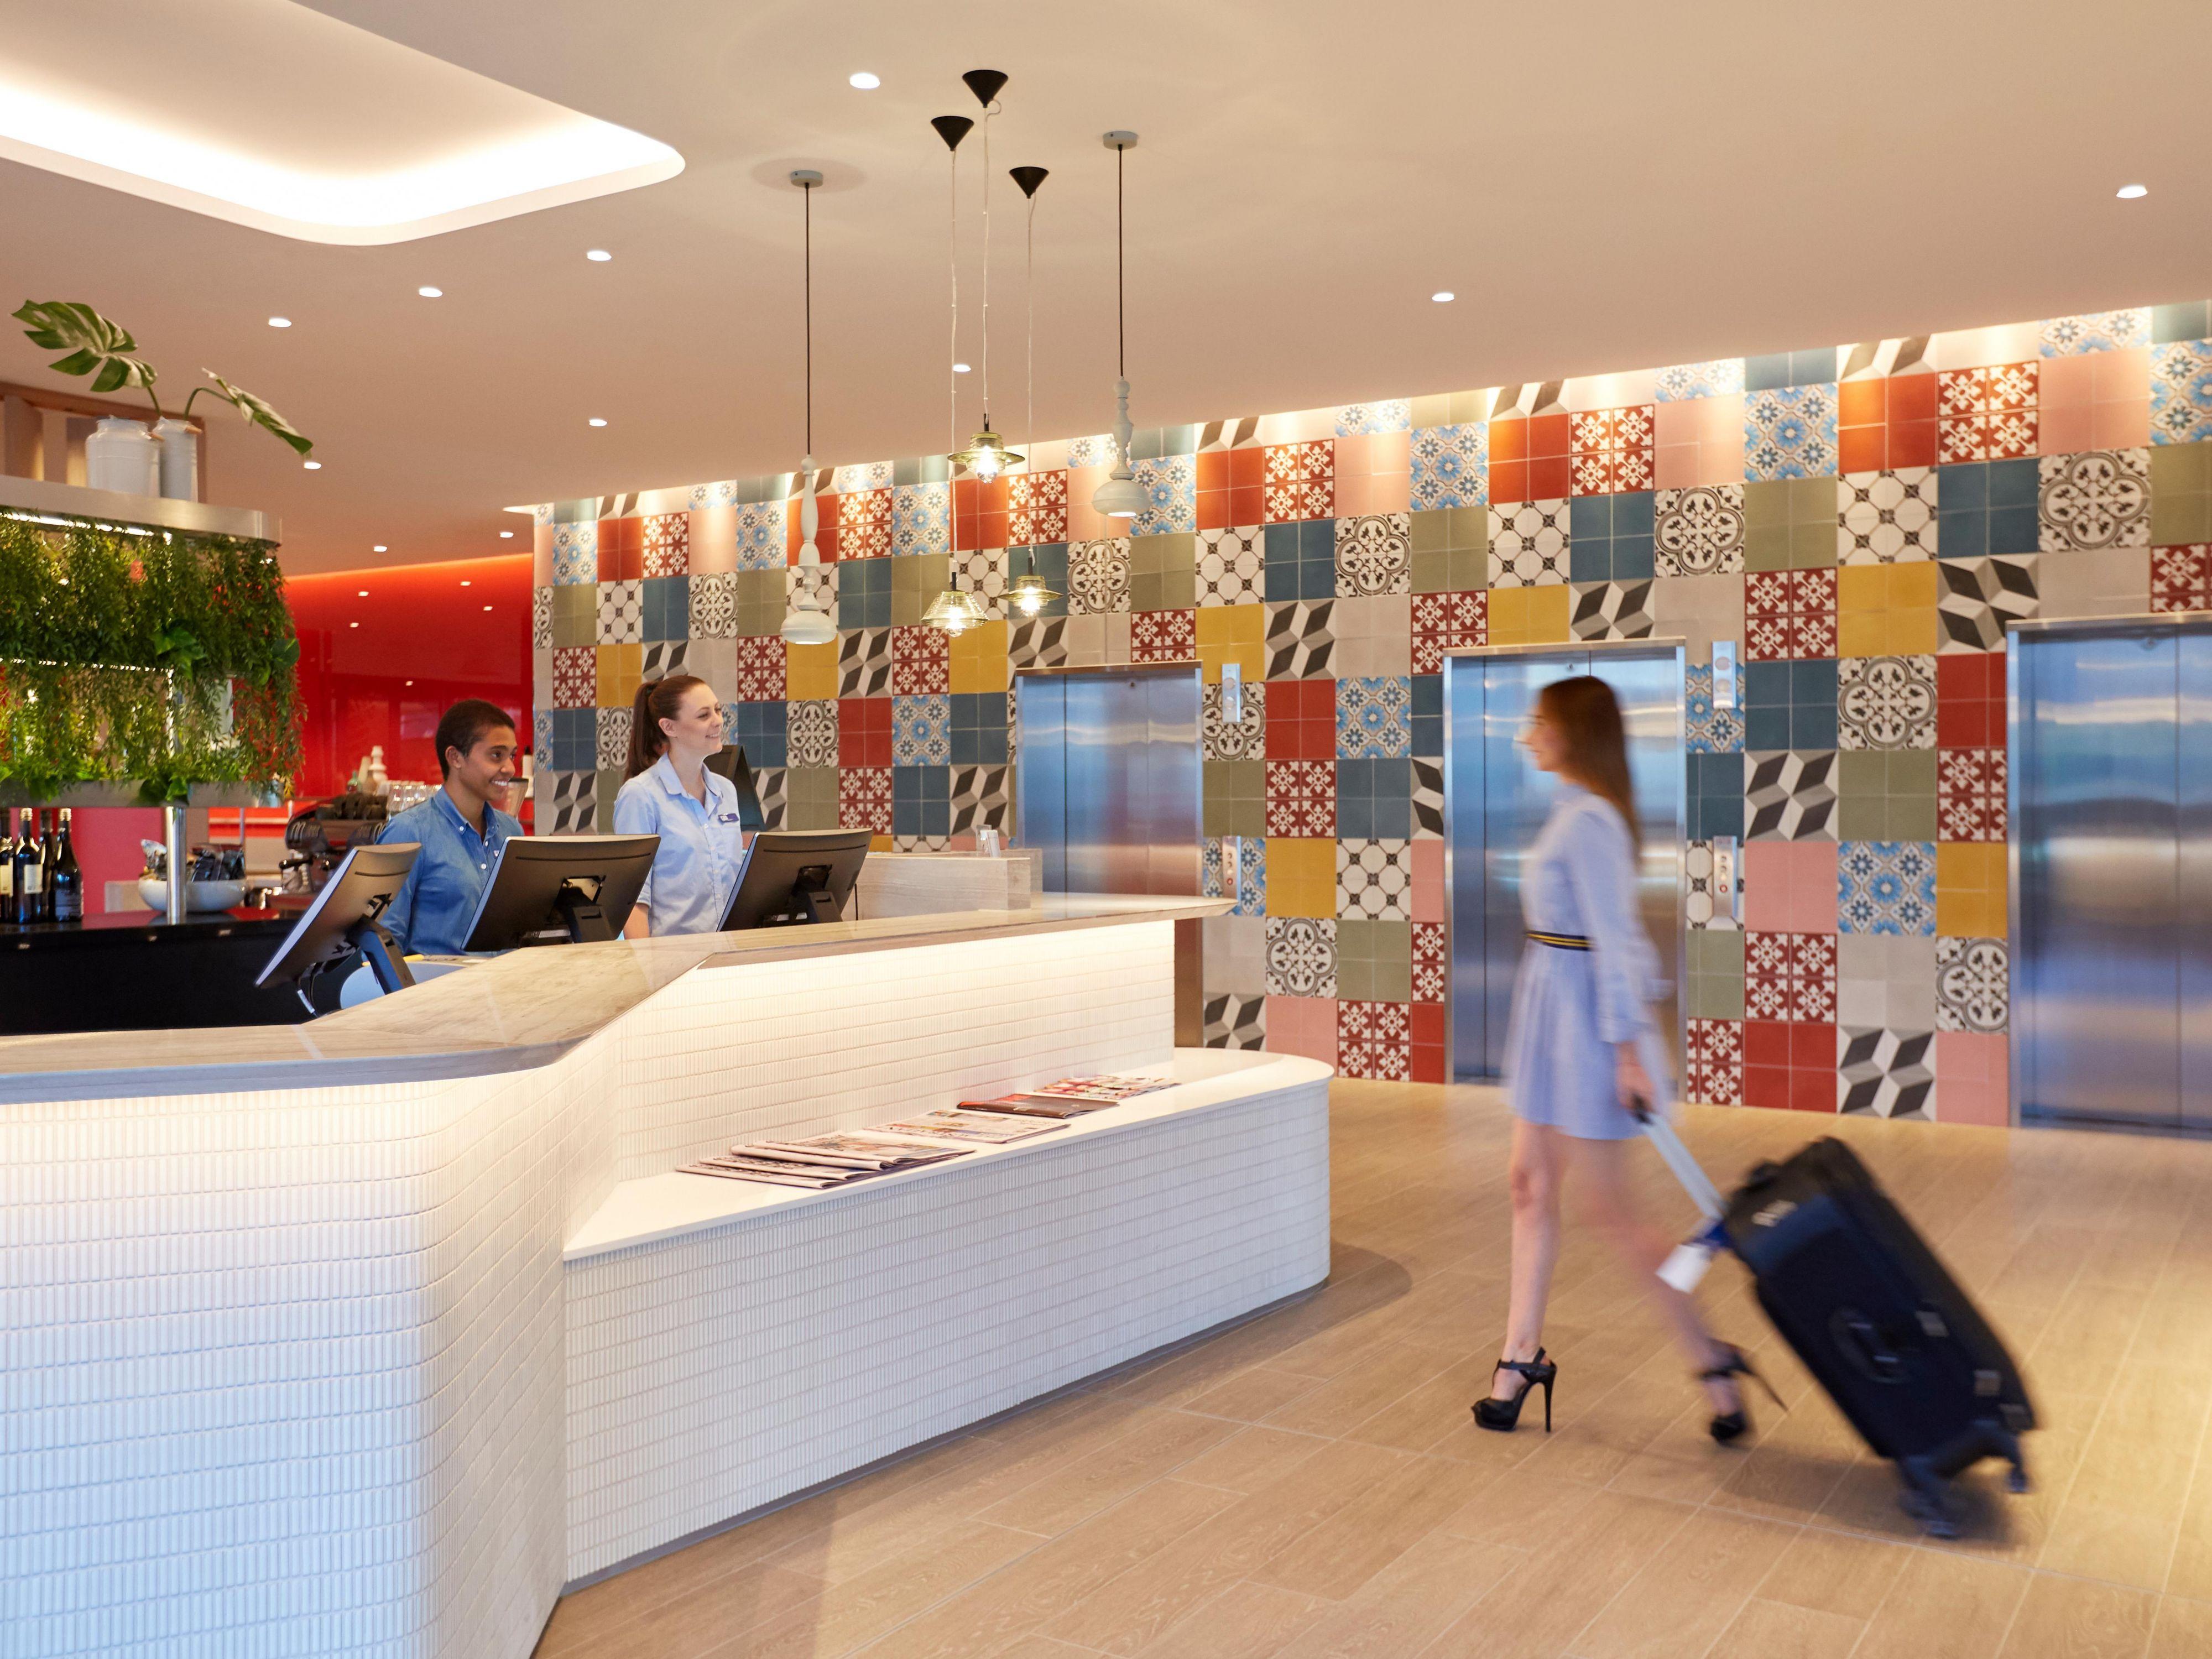 Brisbane City Hotel | Holiday Inn Express Brisbane Central